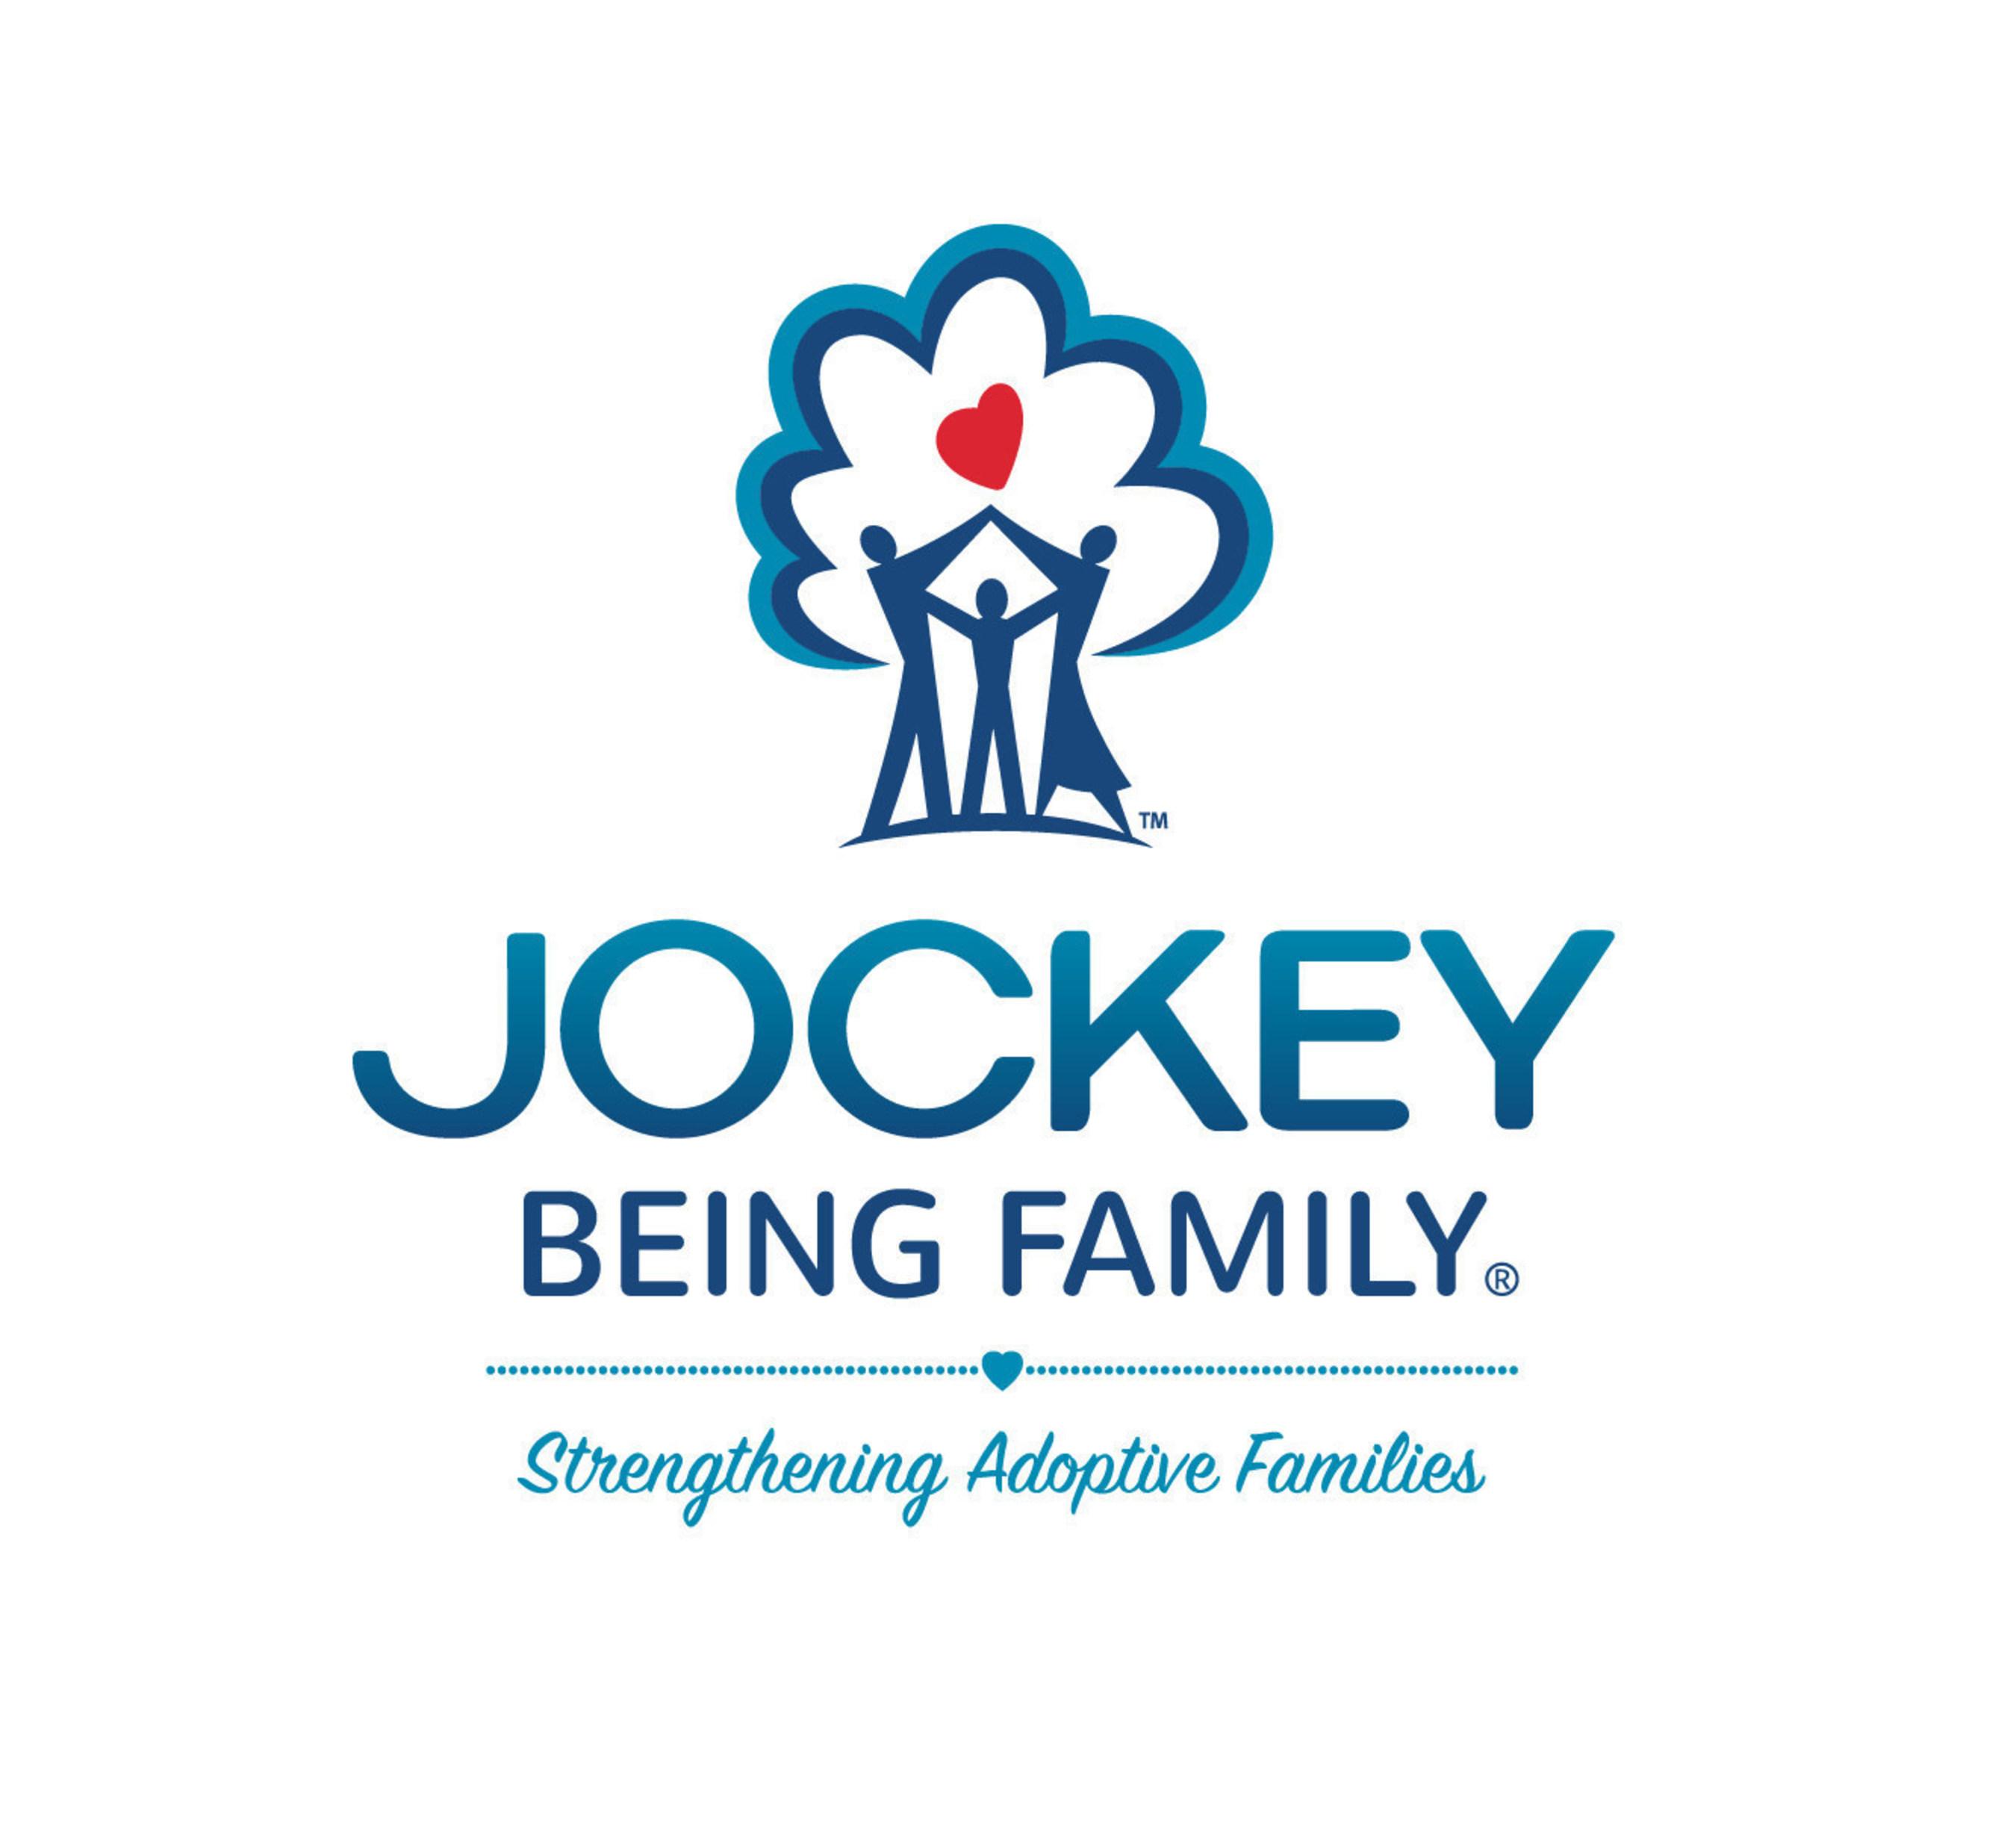 Jockey International, Inc. opens new store in San Clemente, California